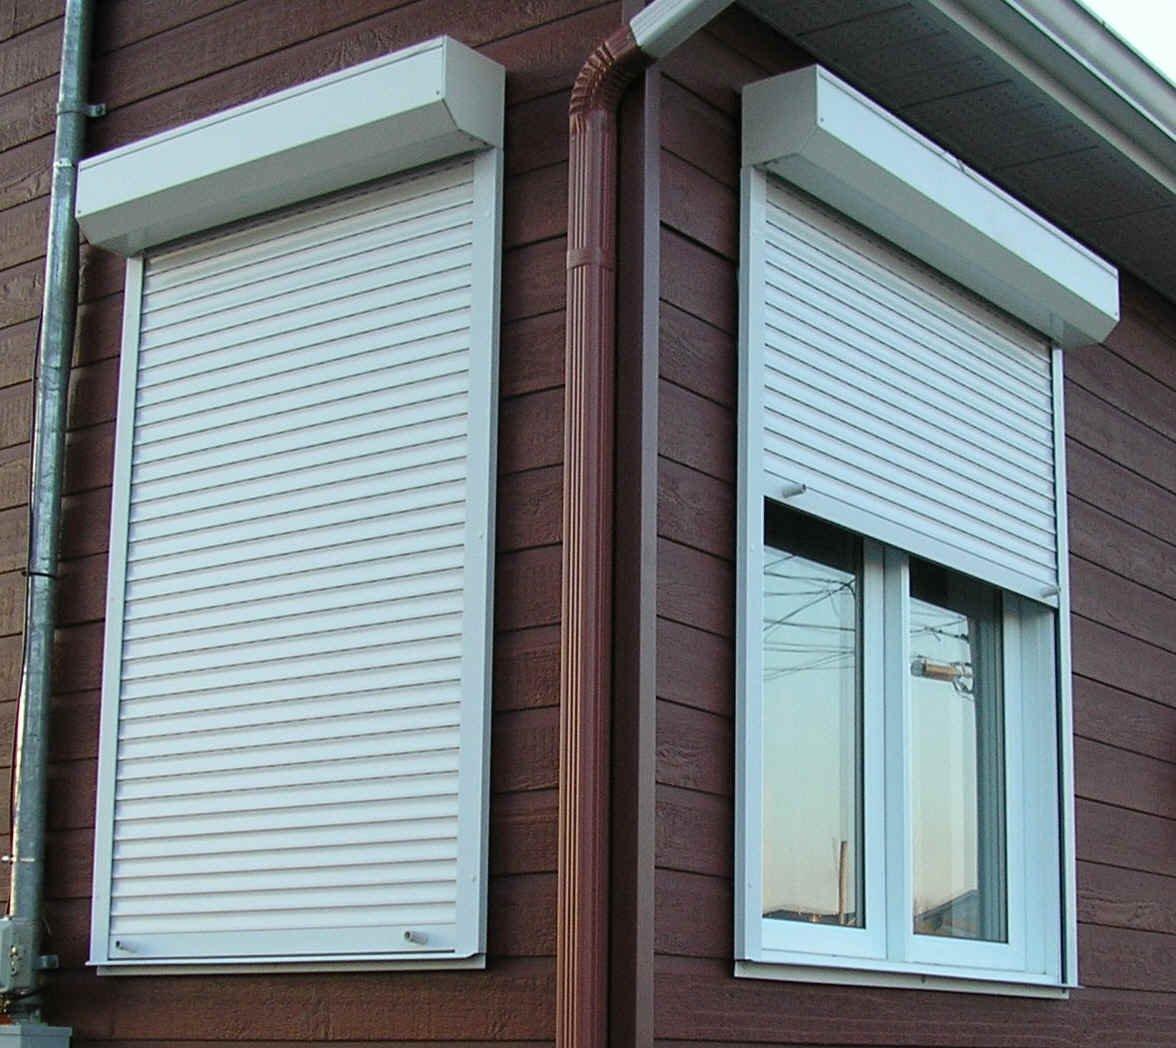 Manual Open Aluminum Shutter Window With Roller Up Rolling Windows Buy Shutters Window Roller Shutter For Windows Manual Open Aluminum Shutter